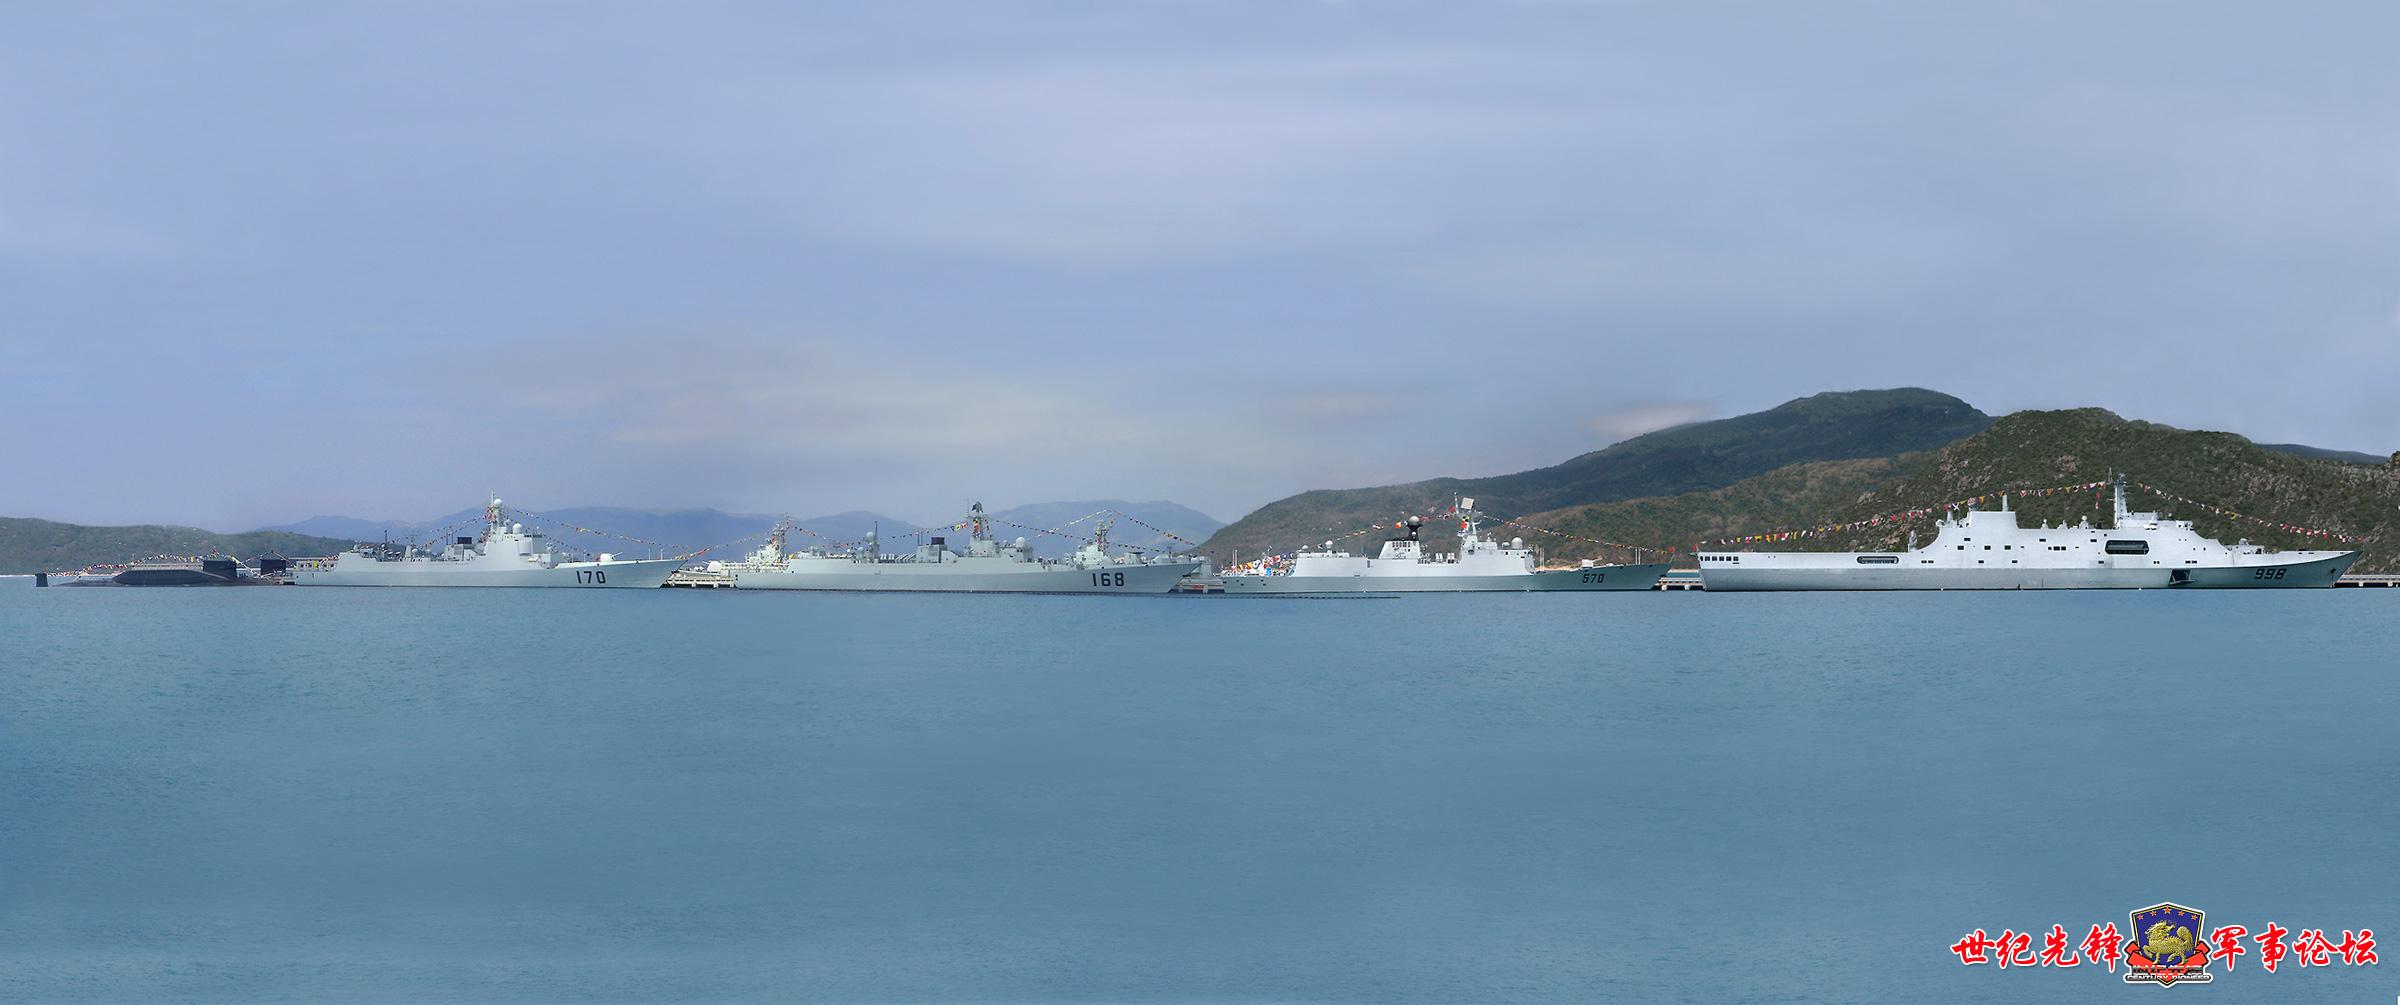 china-south-fleet